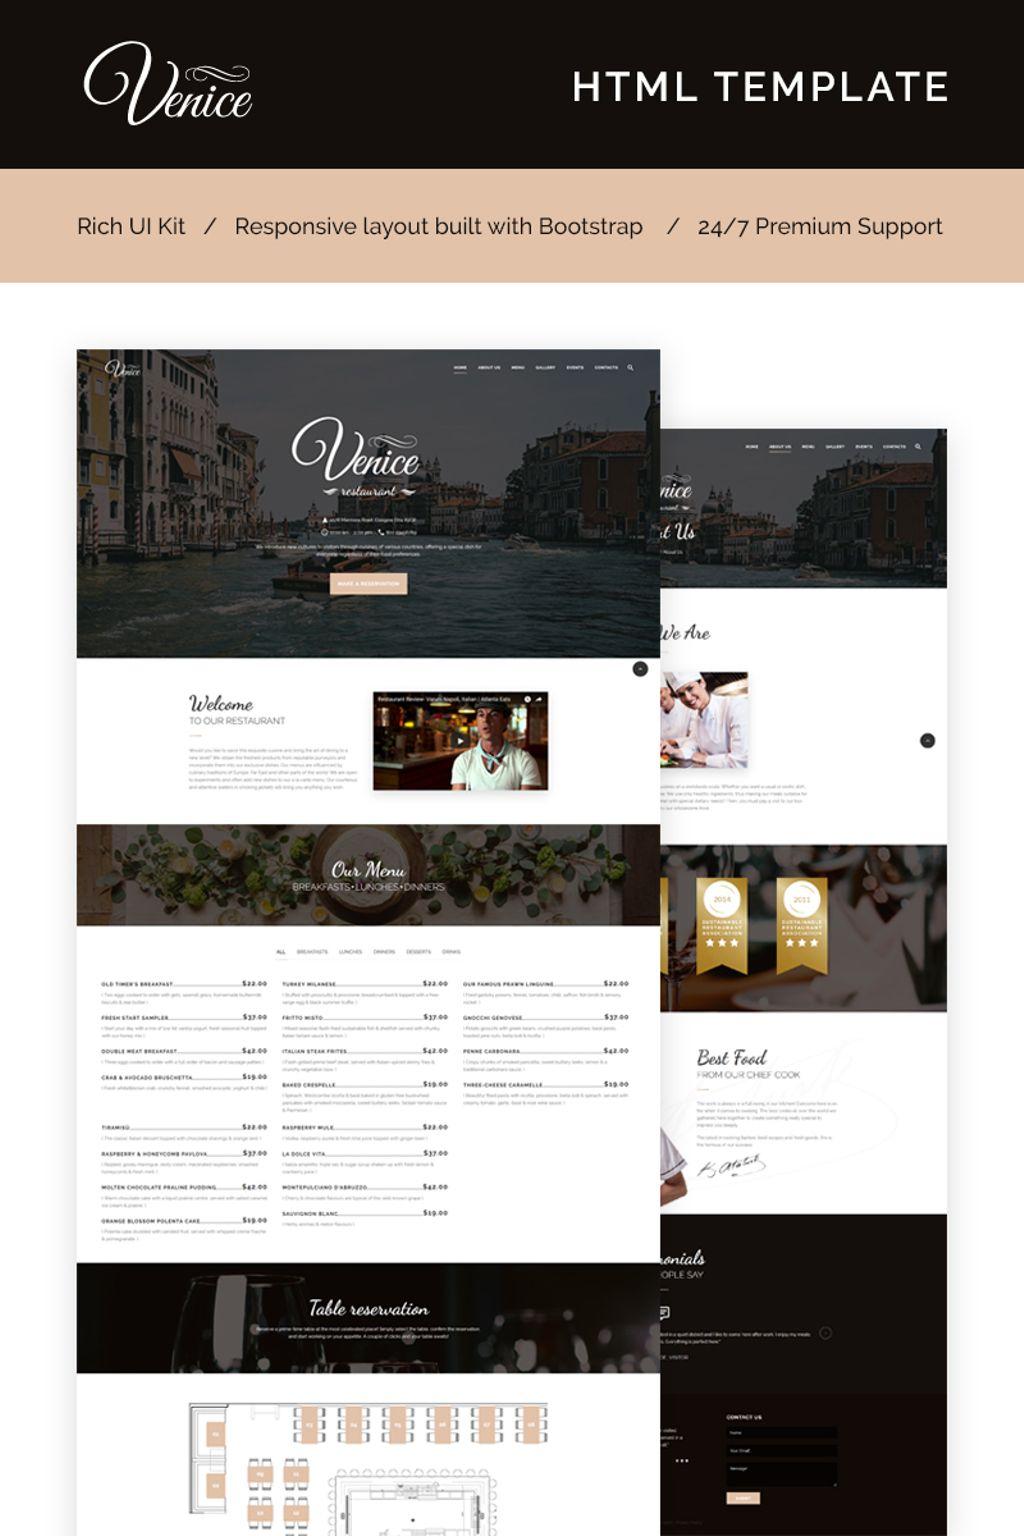 Venice Restaurant - Cafe & Restaurant Responsive Website Template - screenshot